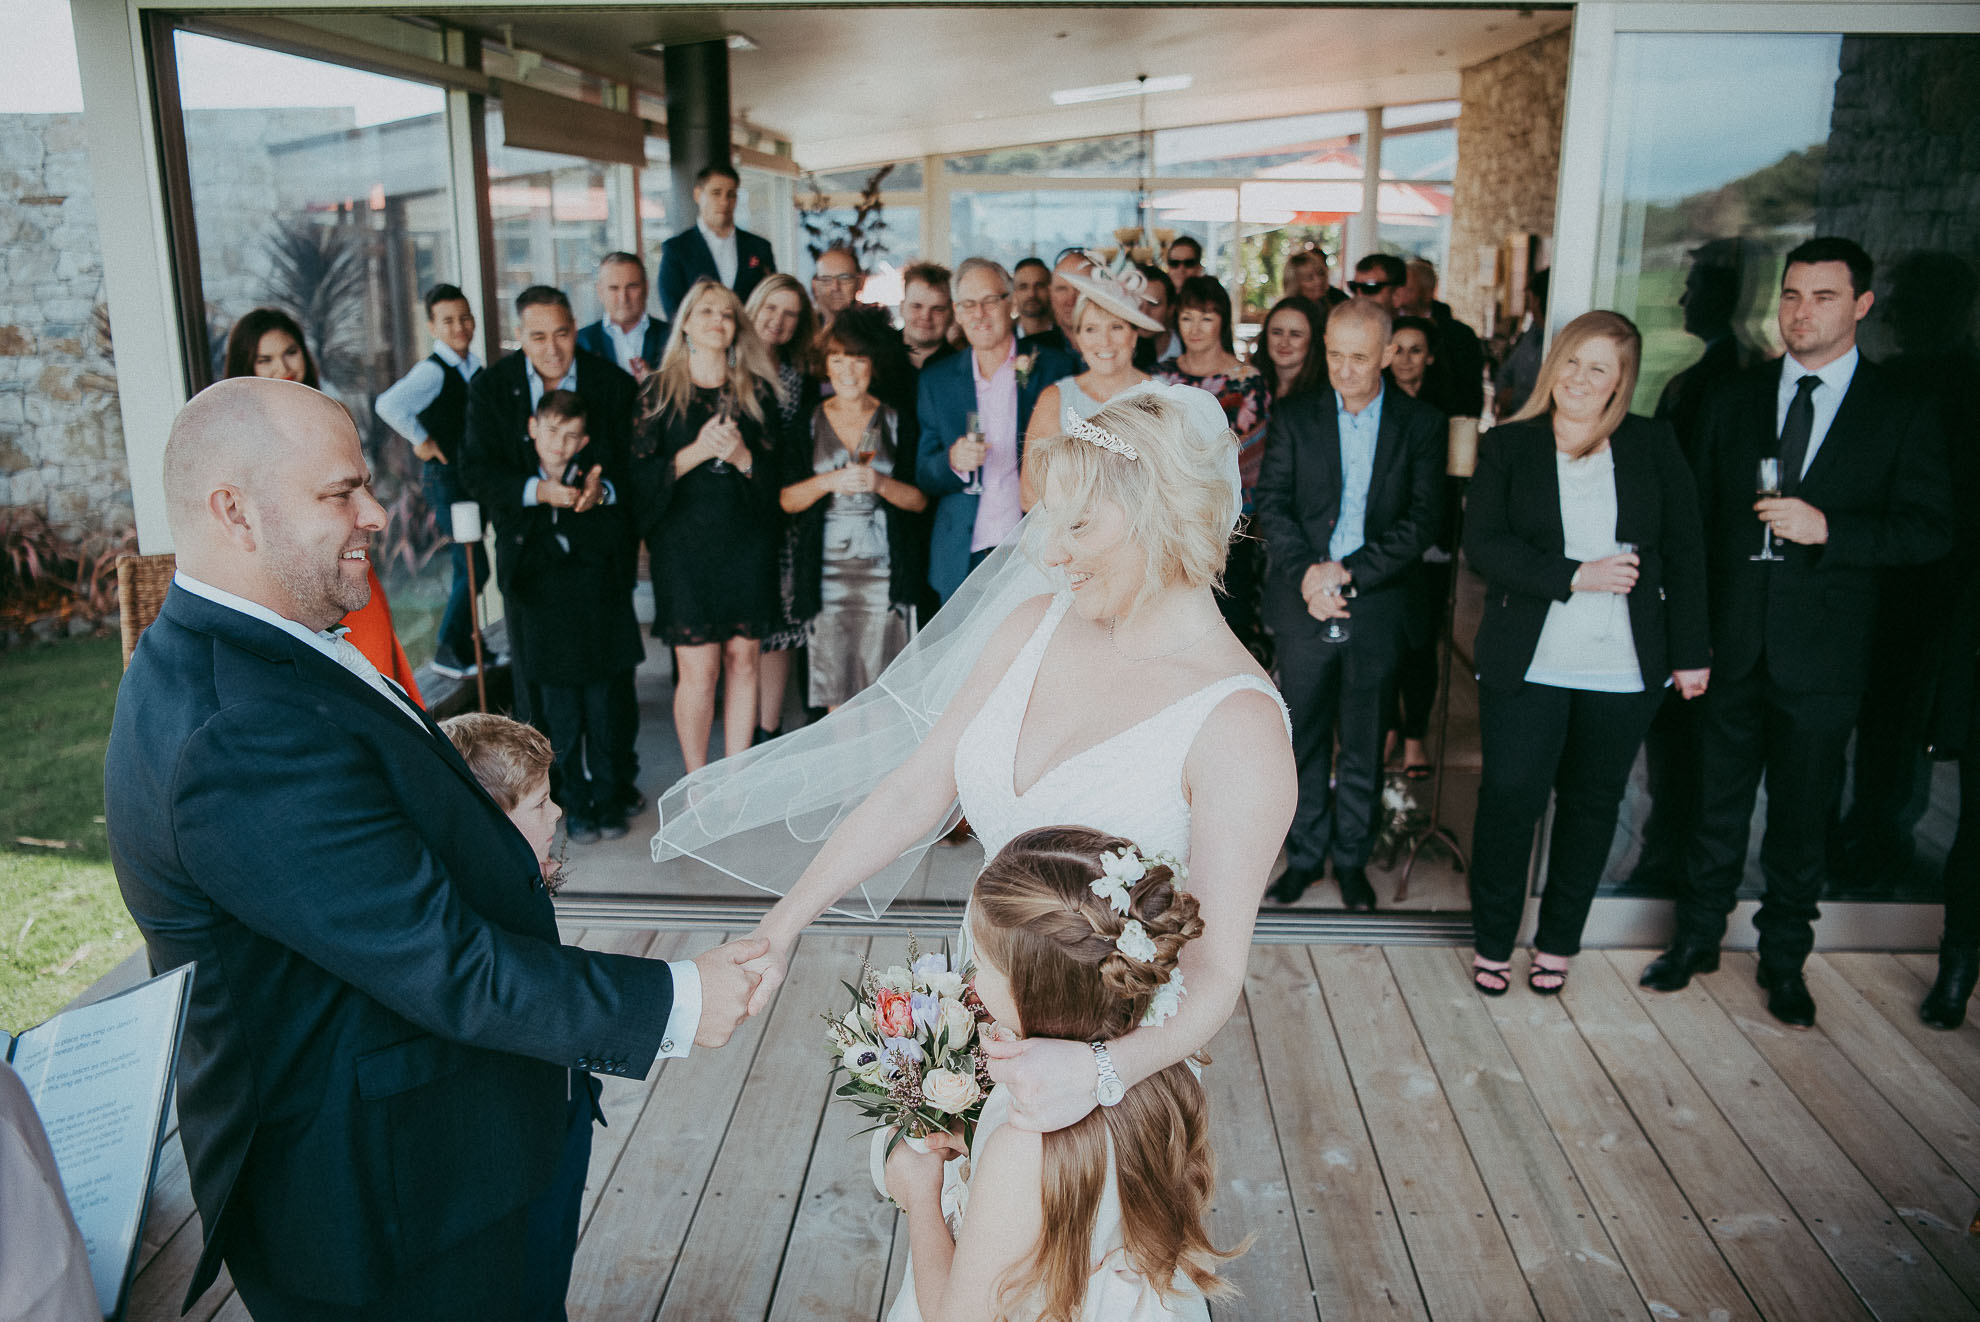 wedding-by-levien-206.JPG